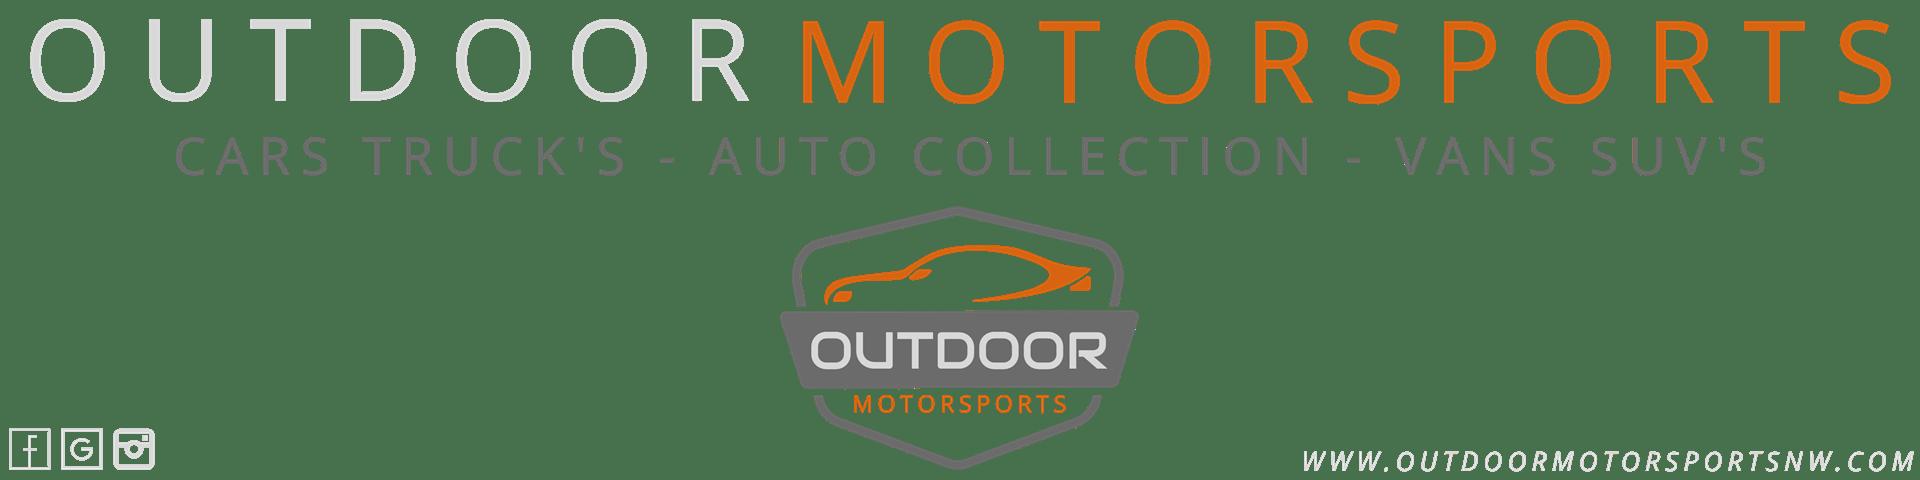 hight resolution of outdoor motorsports llc